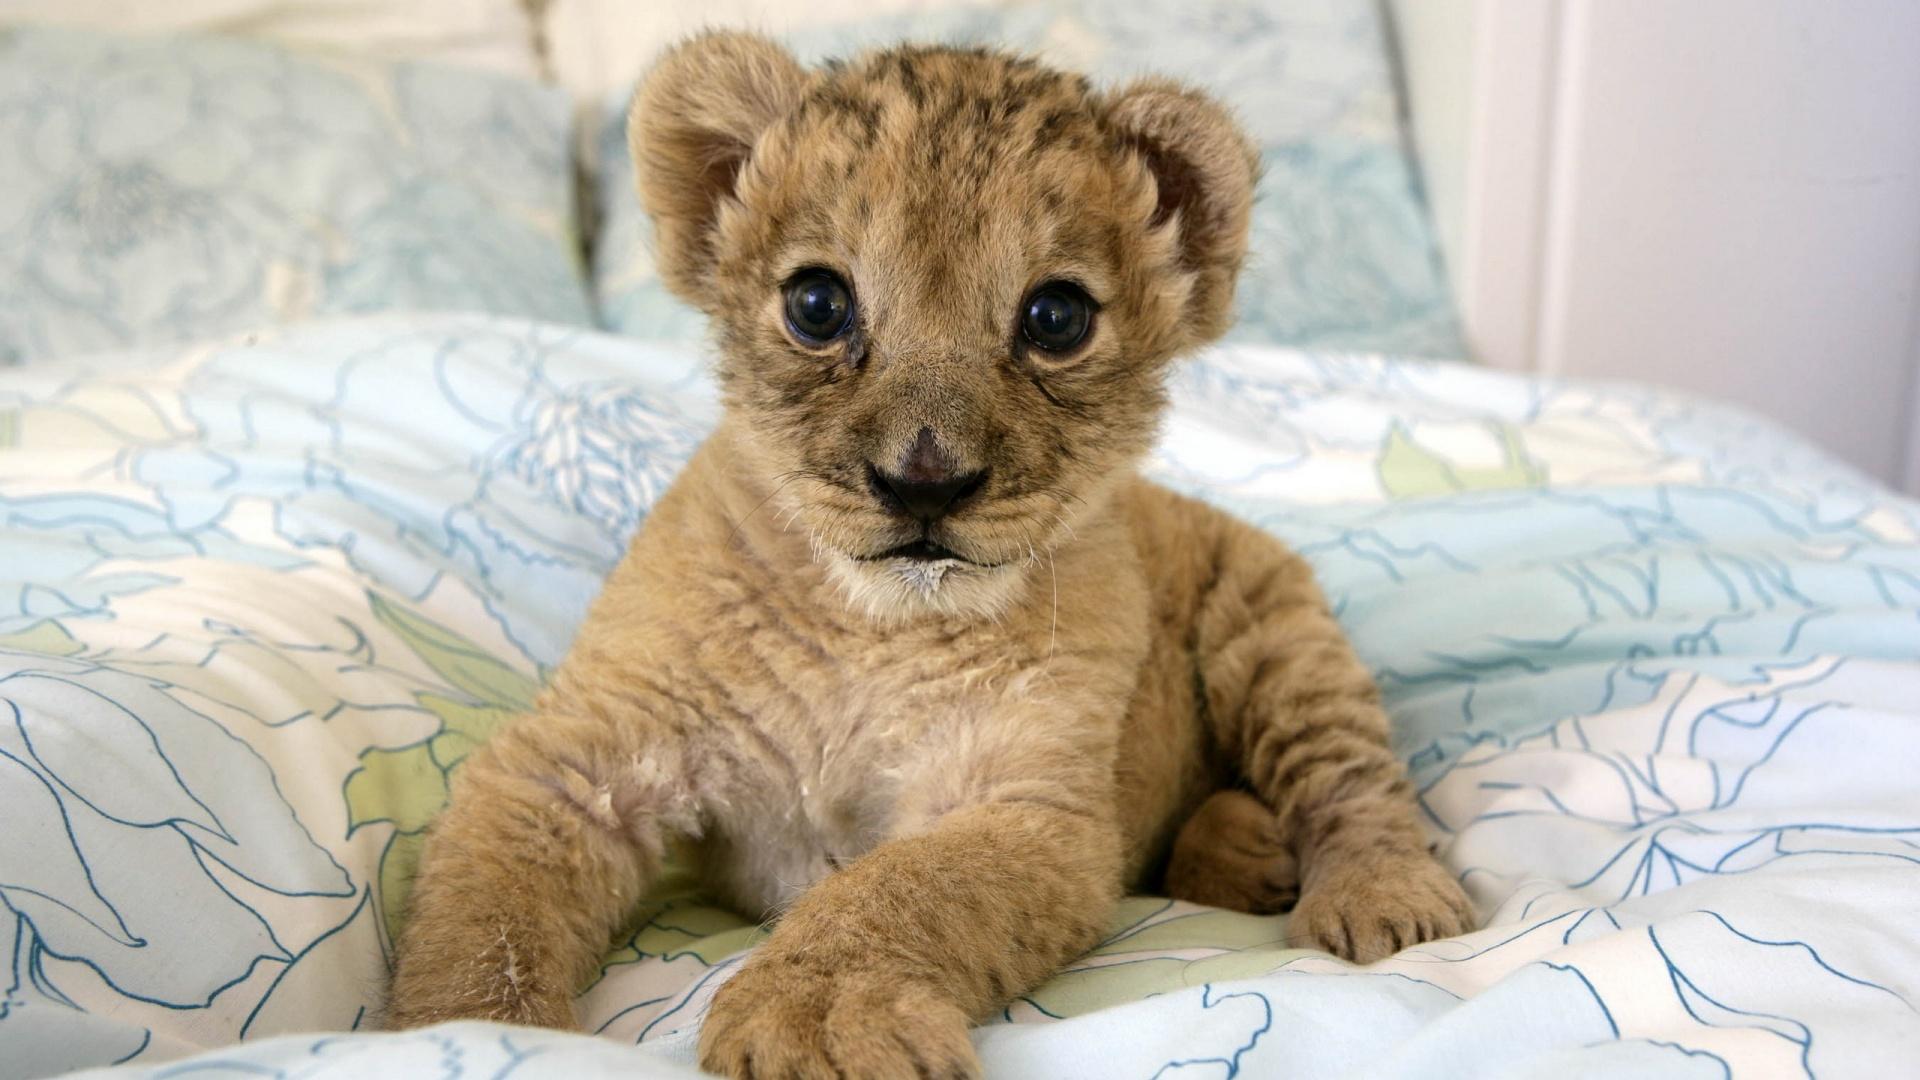 adorable baby lion wallpaper 30521